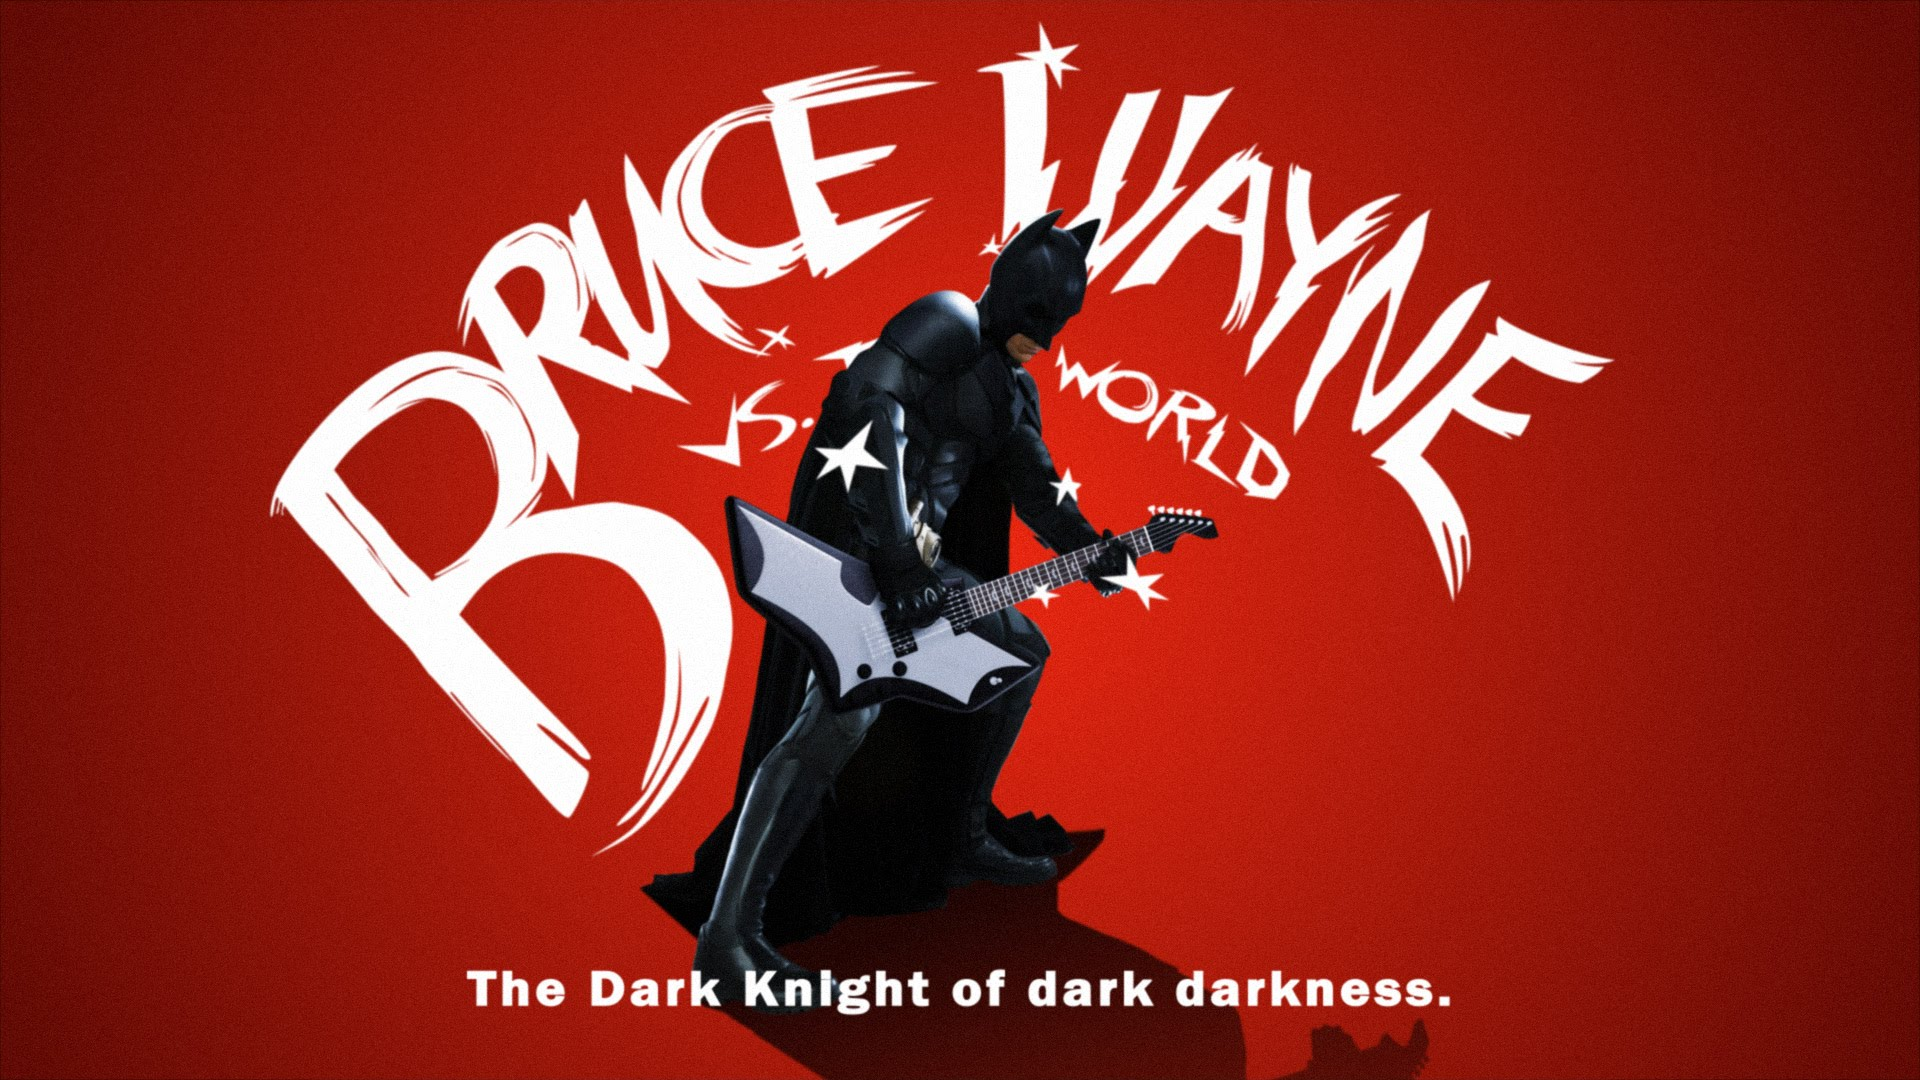 Bruce Wayne vs. The World: se Batman fosse Scott Pilgrim